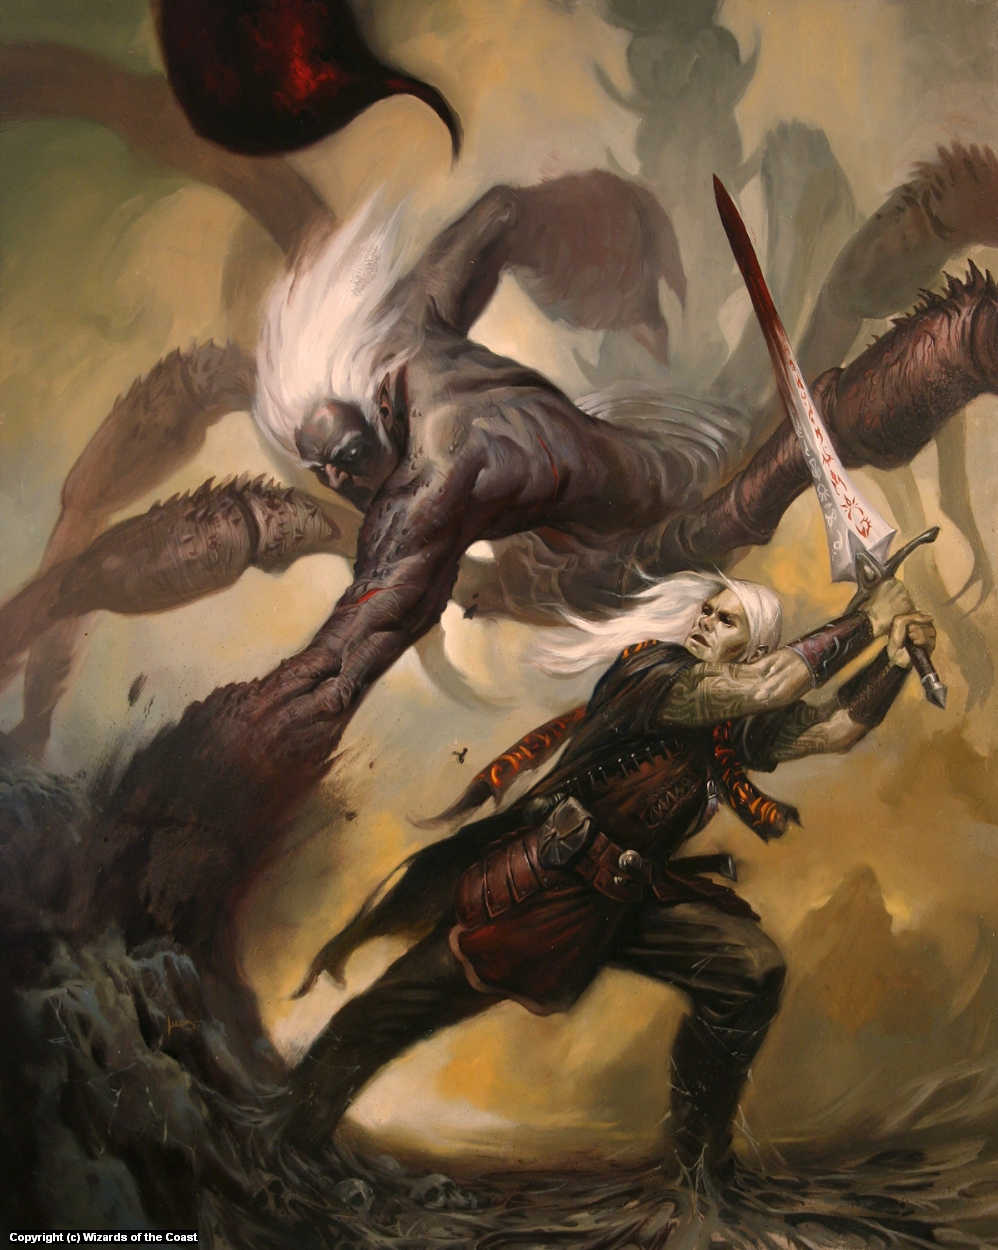 Sword of the Gods Artwork by Lucas Graciano